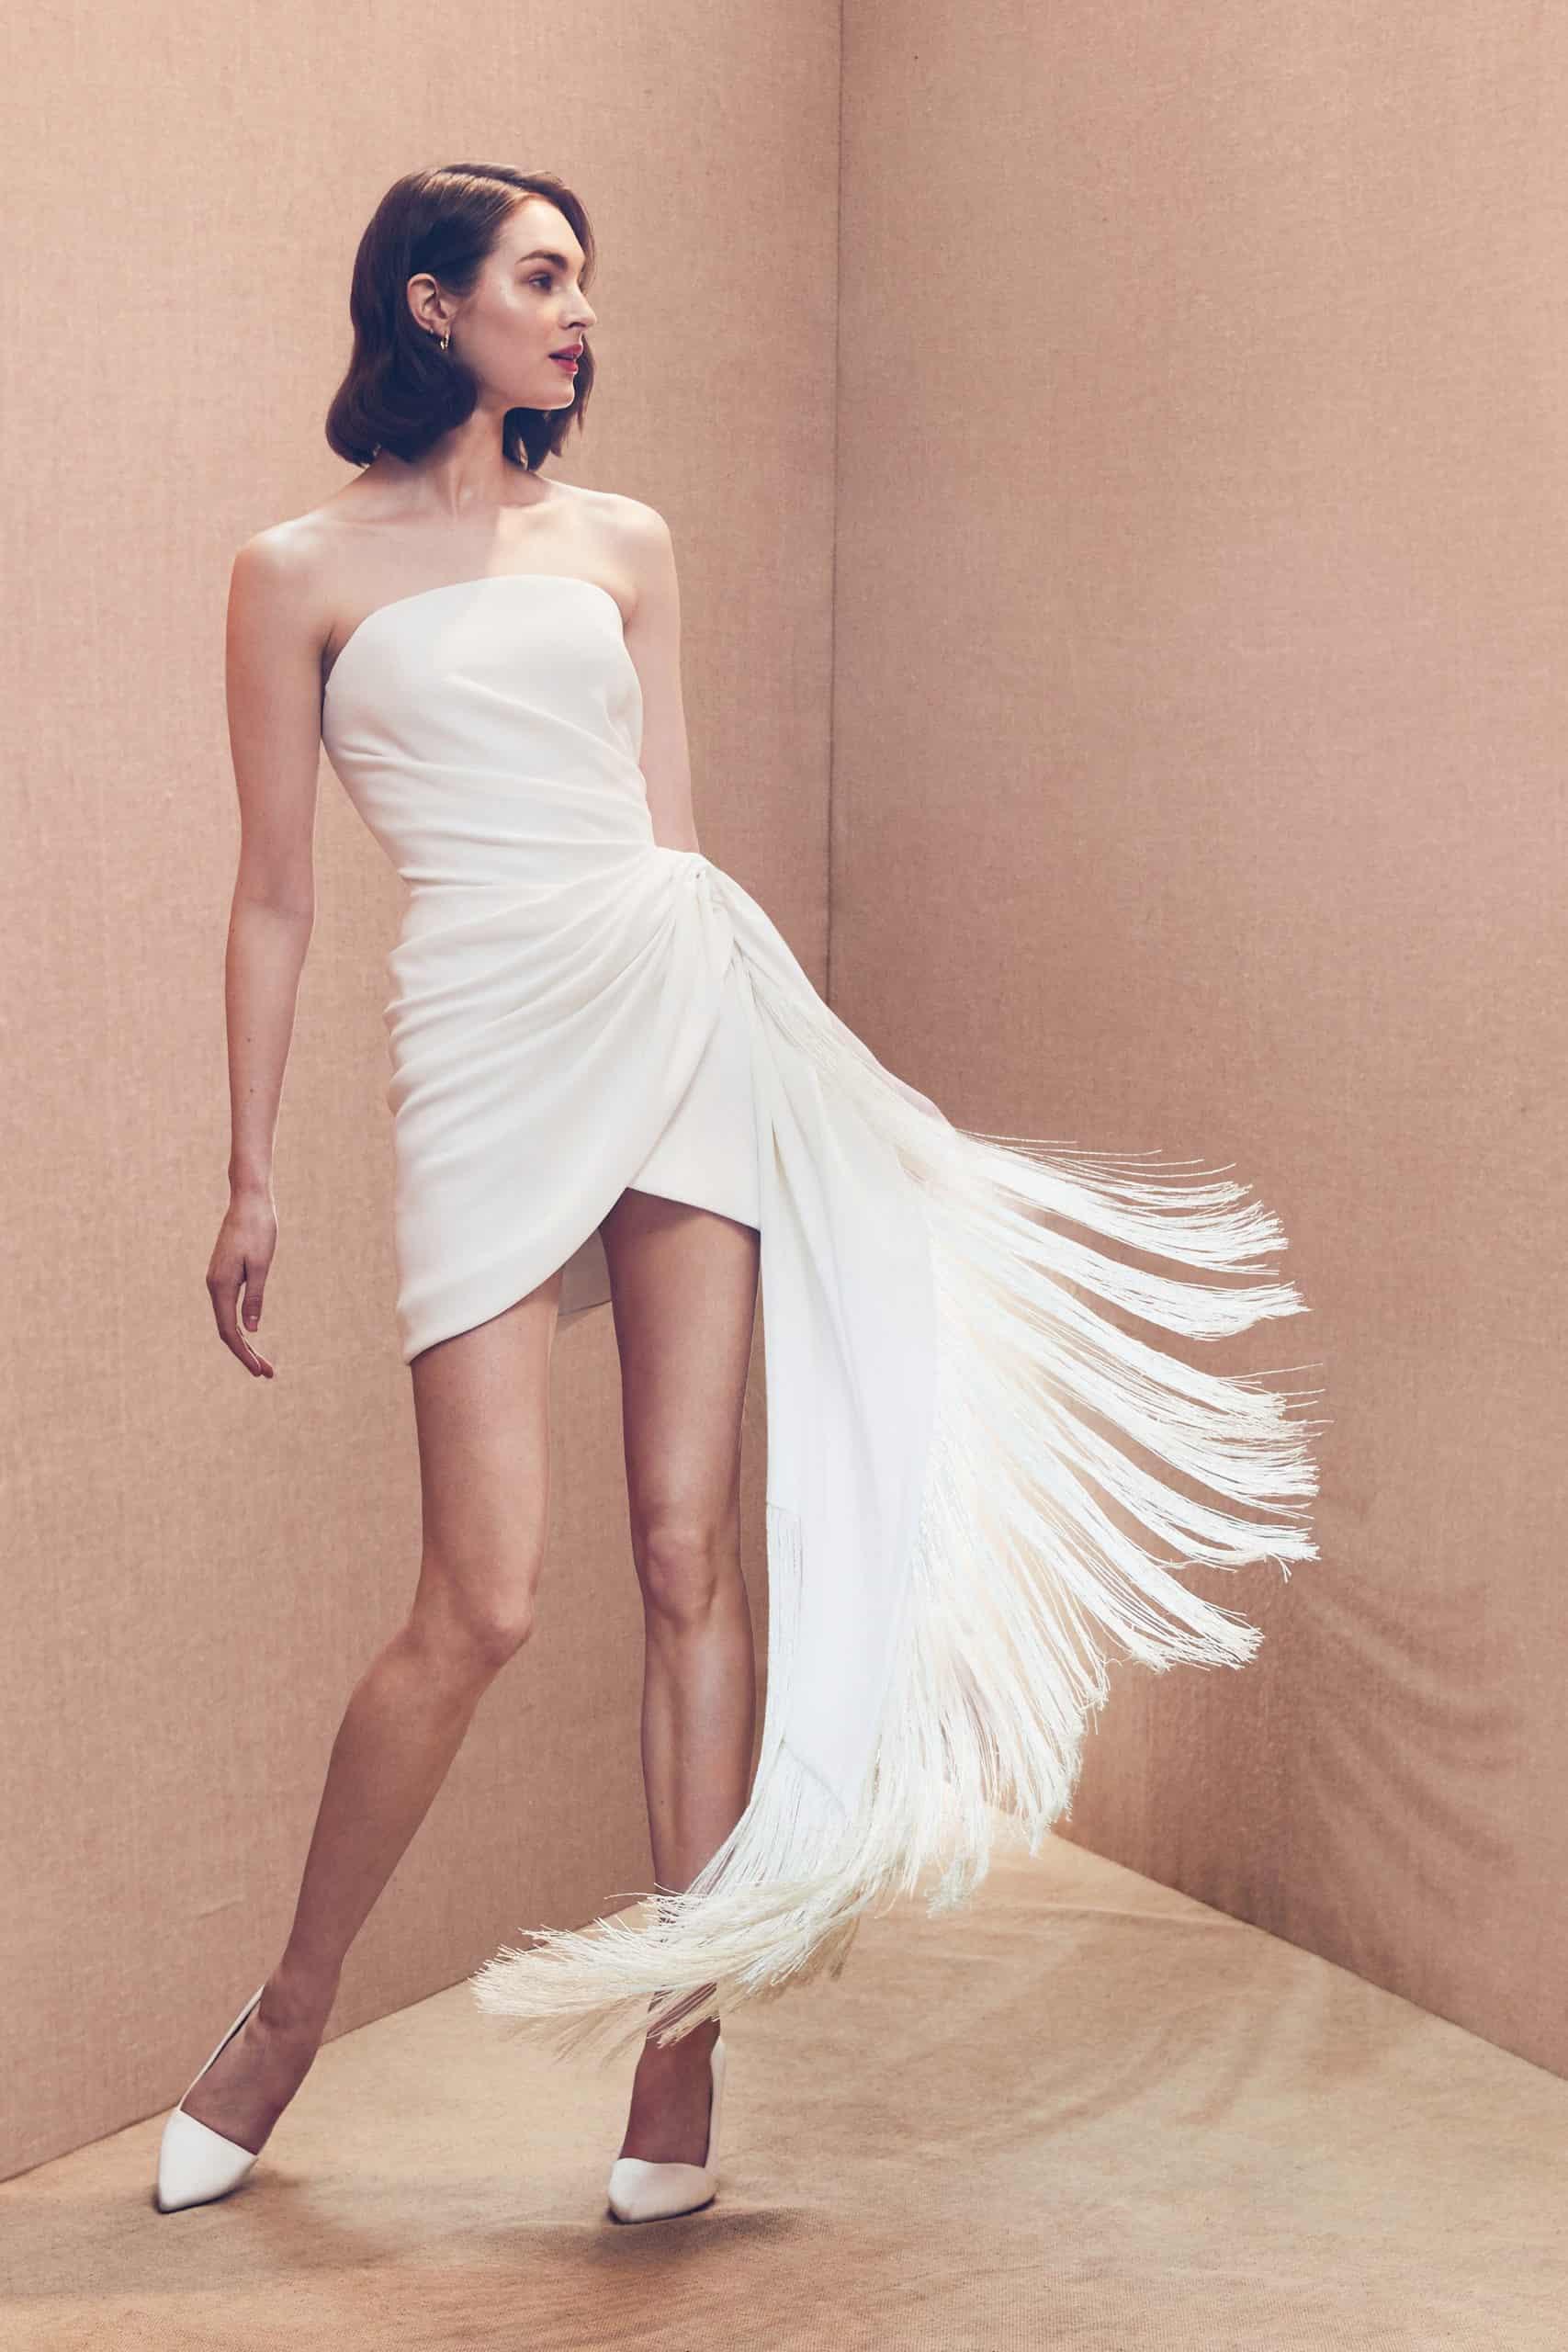 a short strapless wedding dress with a feather tail by Oscar de la Renta